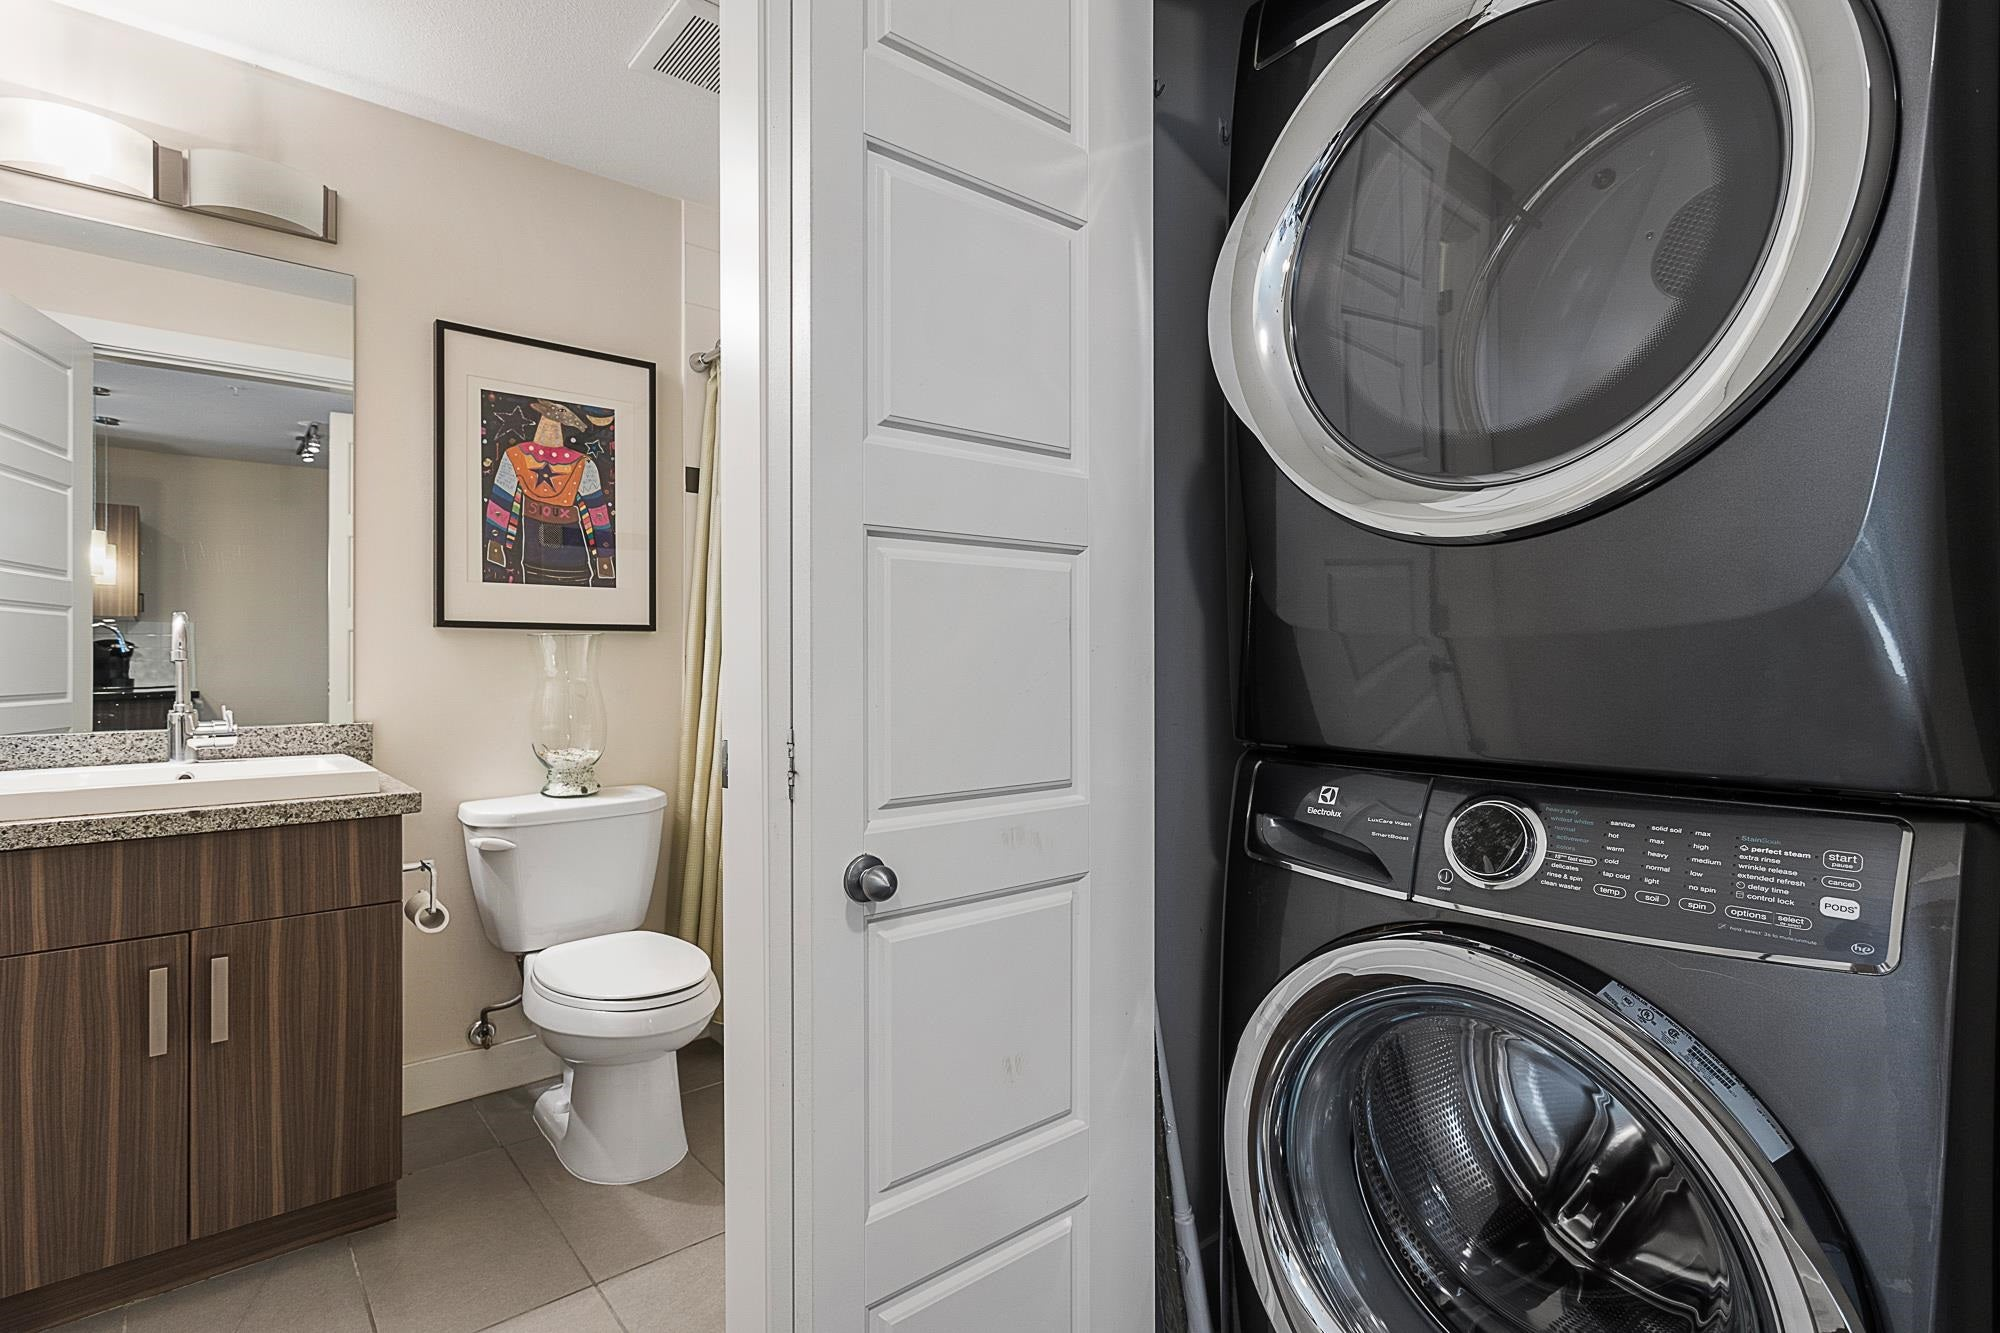 114 20219 54A AVENUE - Langley City Apartment/Condo for sale, 1 Bedroom (R2616172) - #23